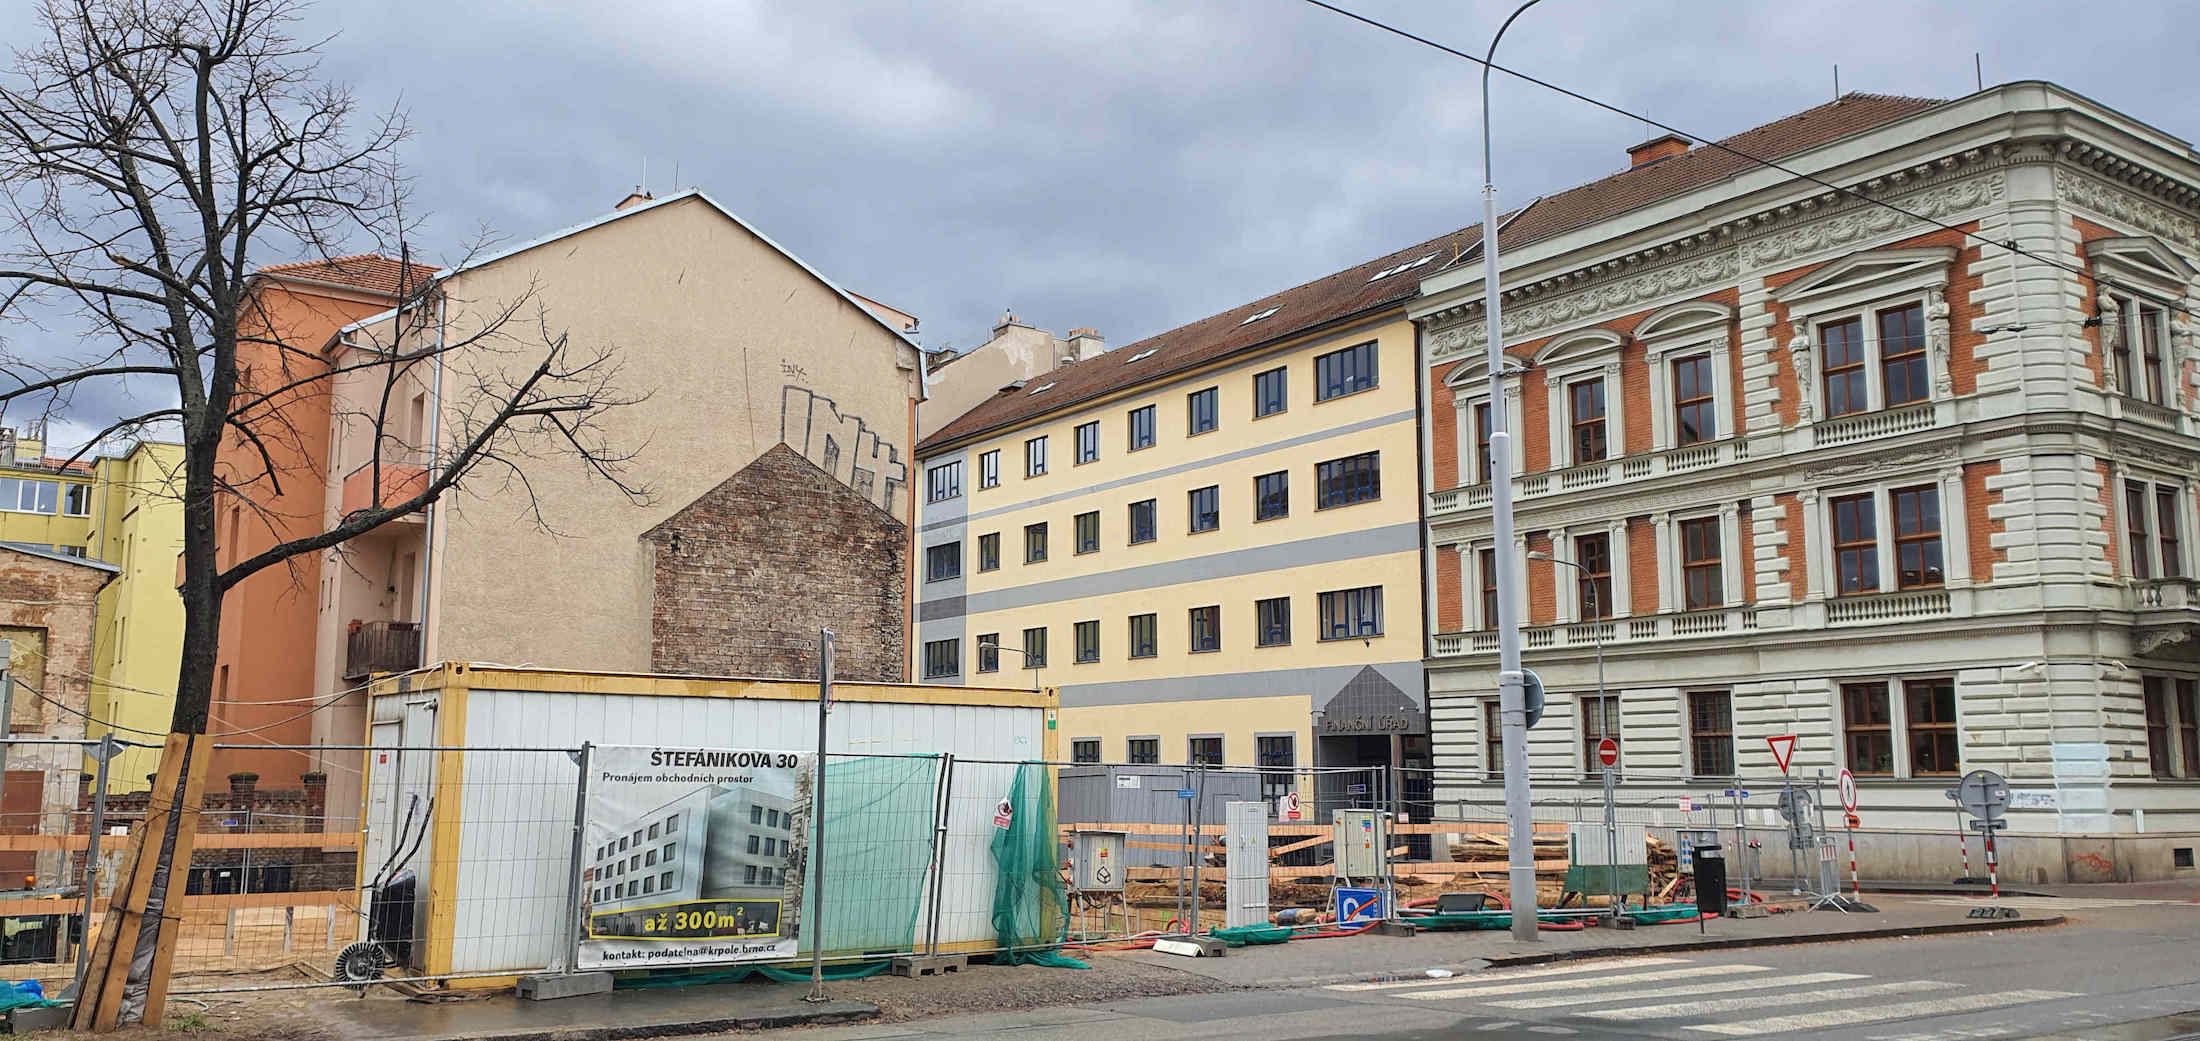 Polyfunkční dům na urohu ulic Rybníček a Štefánikova